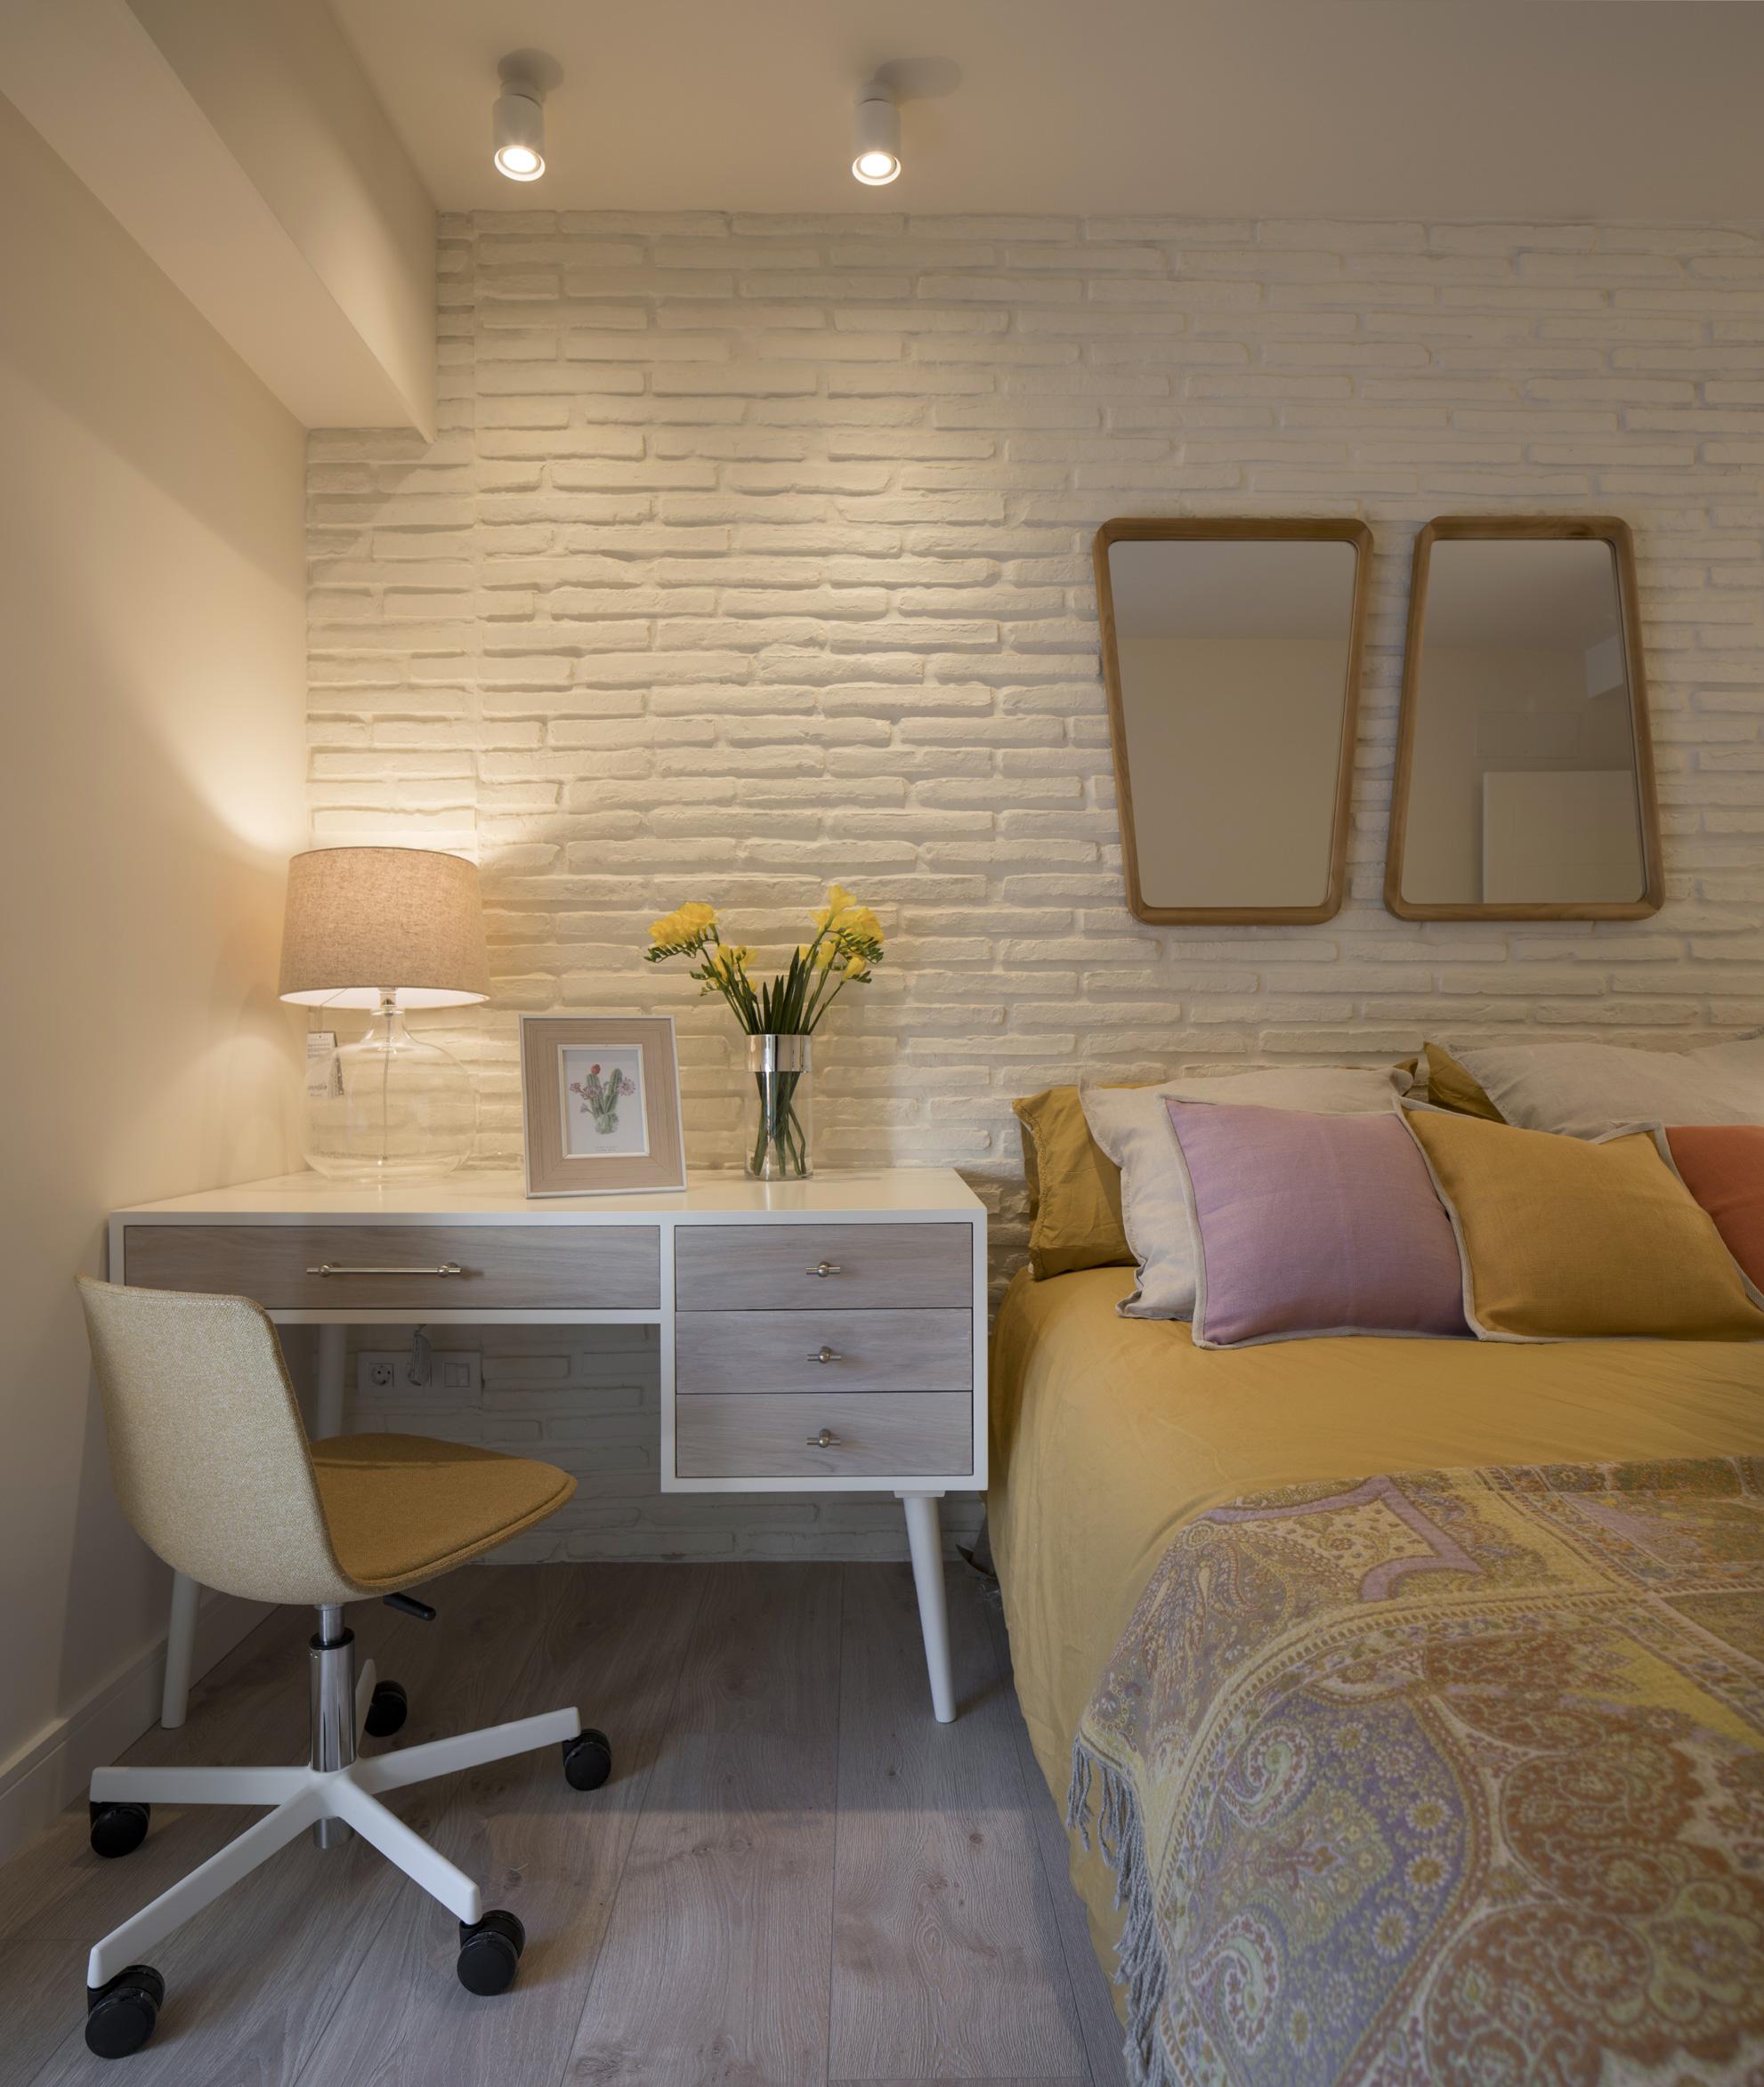 Sube Interiorismo Donostia reforma integral de vivienda Gipuzkoa